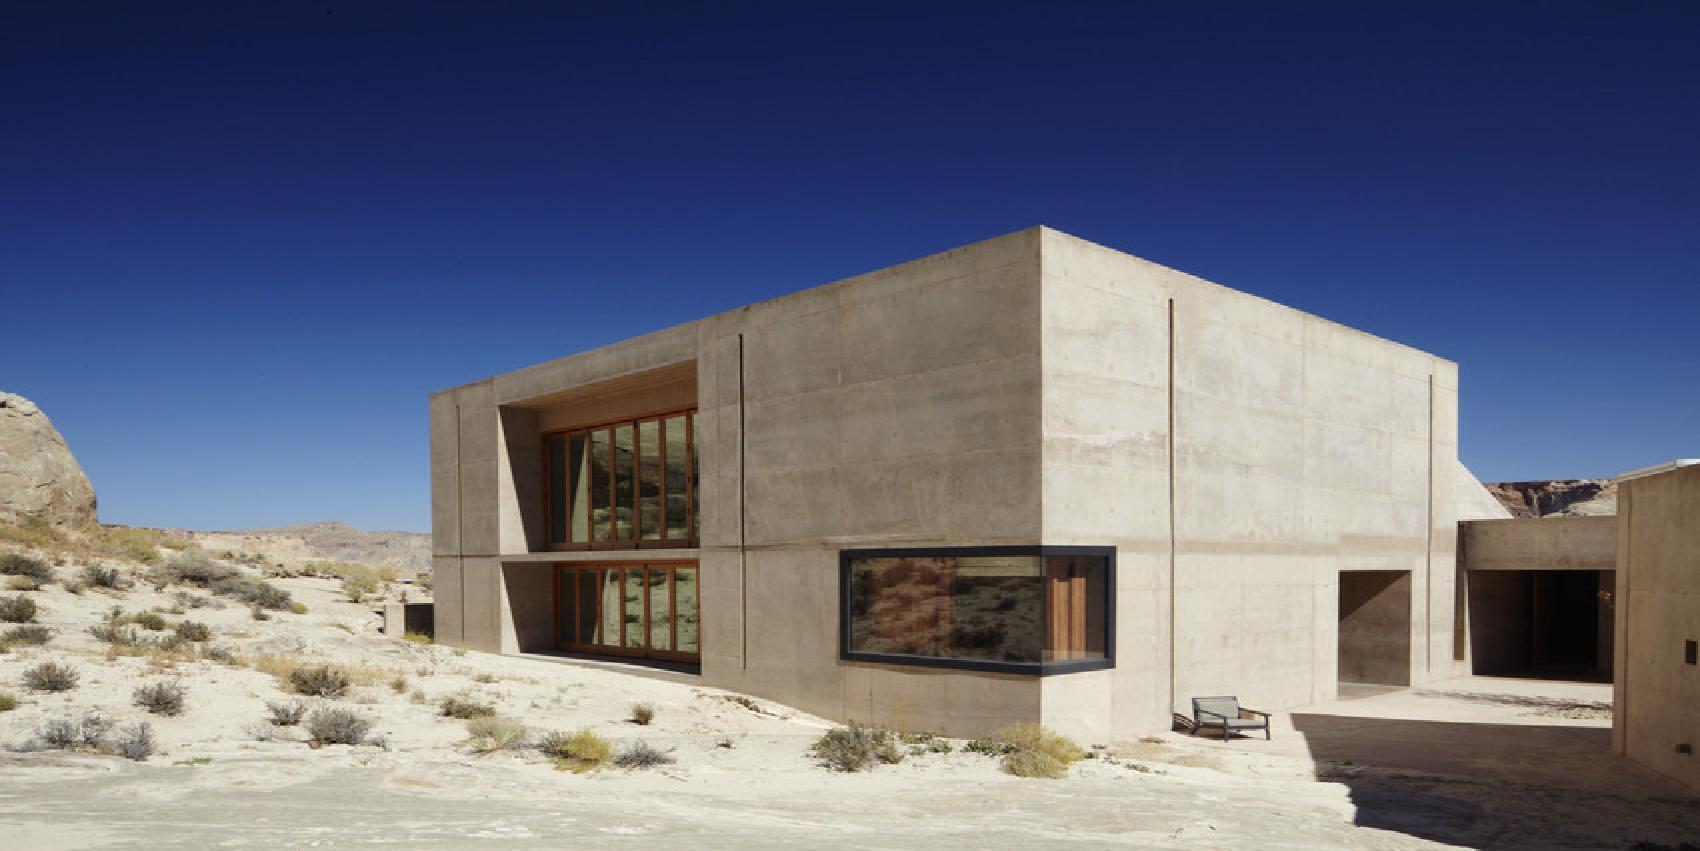 Amangiri Resort Utah Face To Face With Nature Floornature